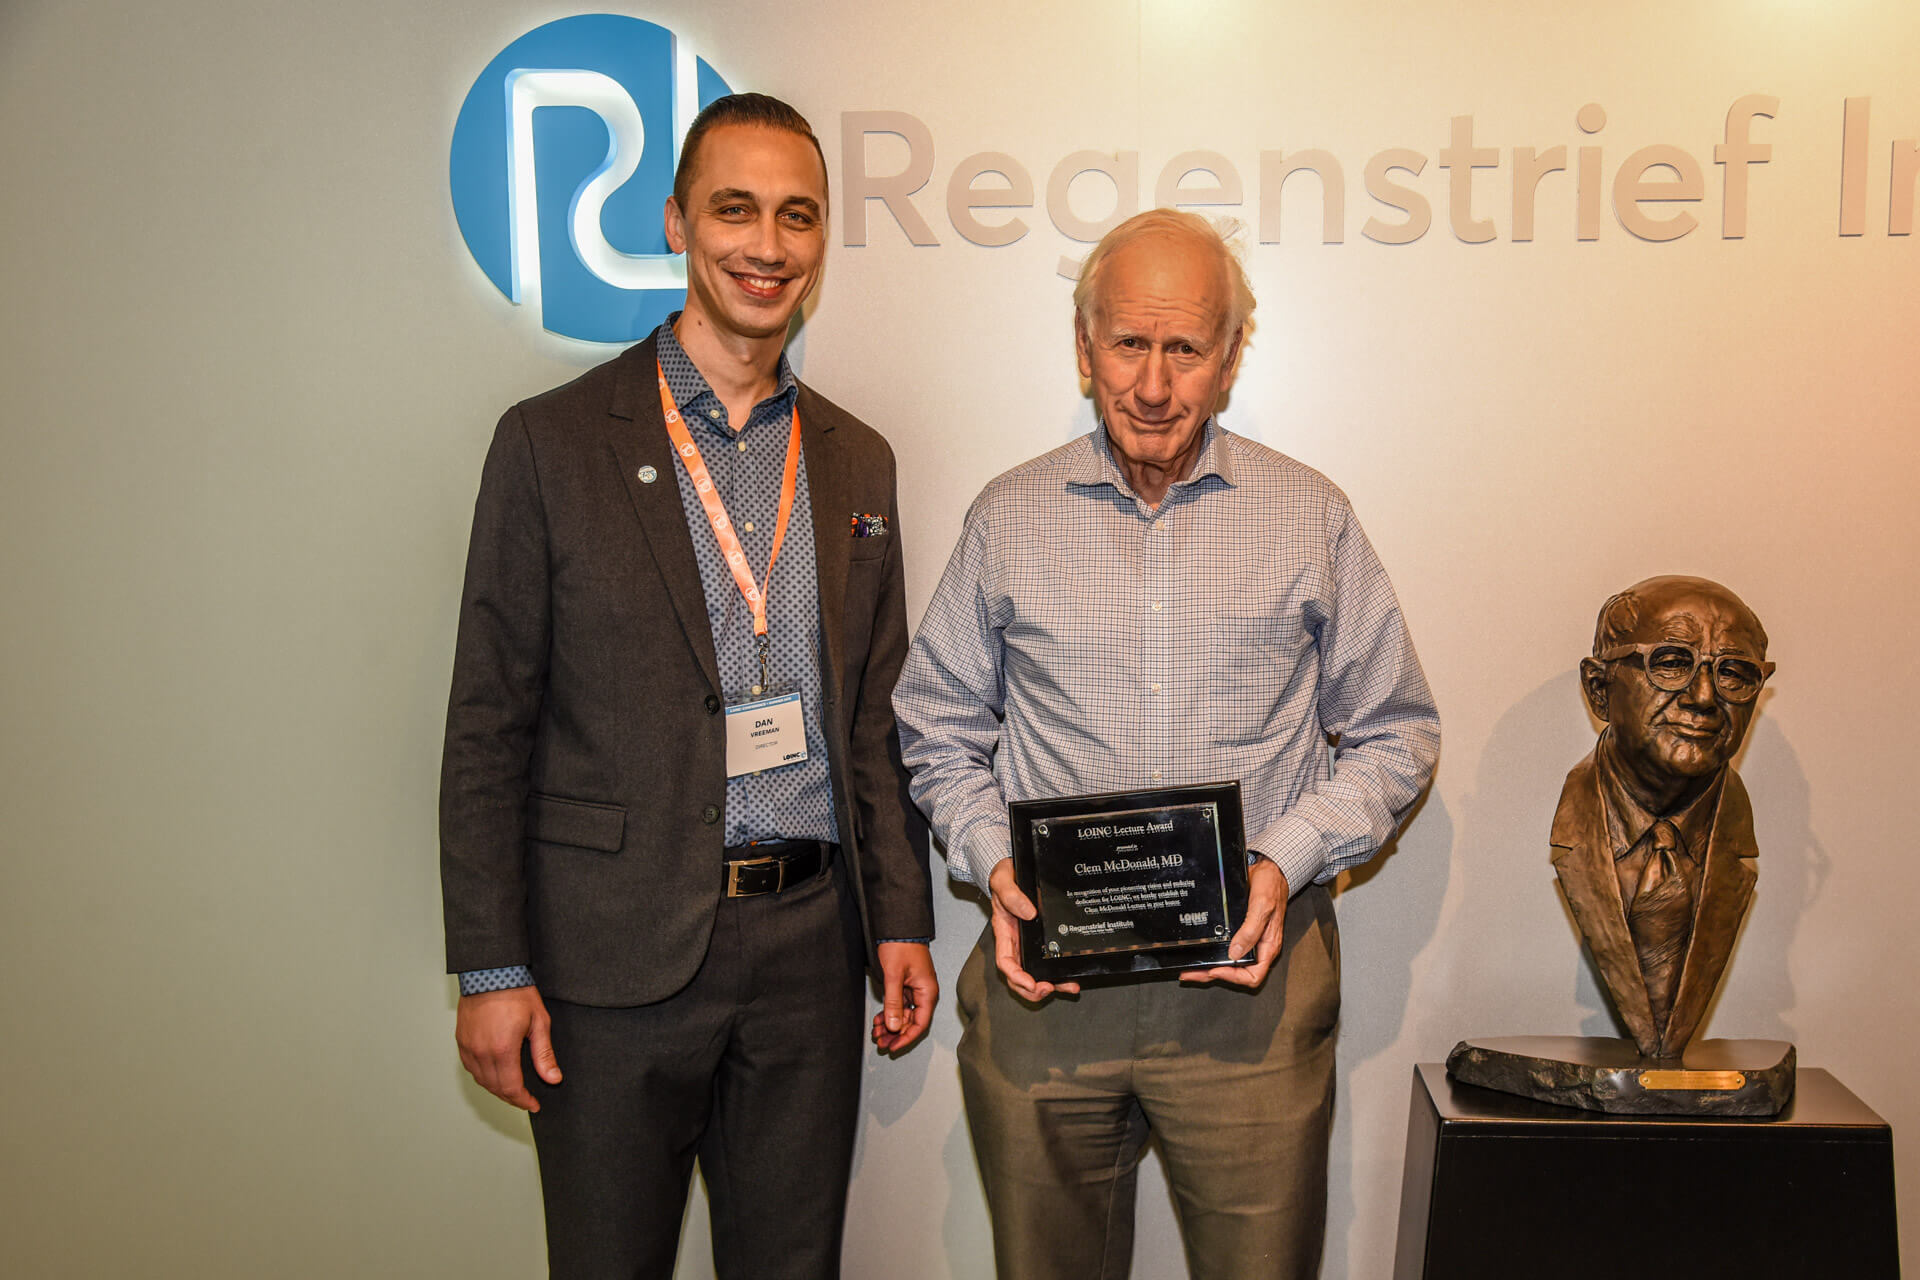 Dr. Daniel Vreeman and Dr. Clem McDonald LOINC Lectureship Award